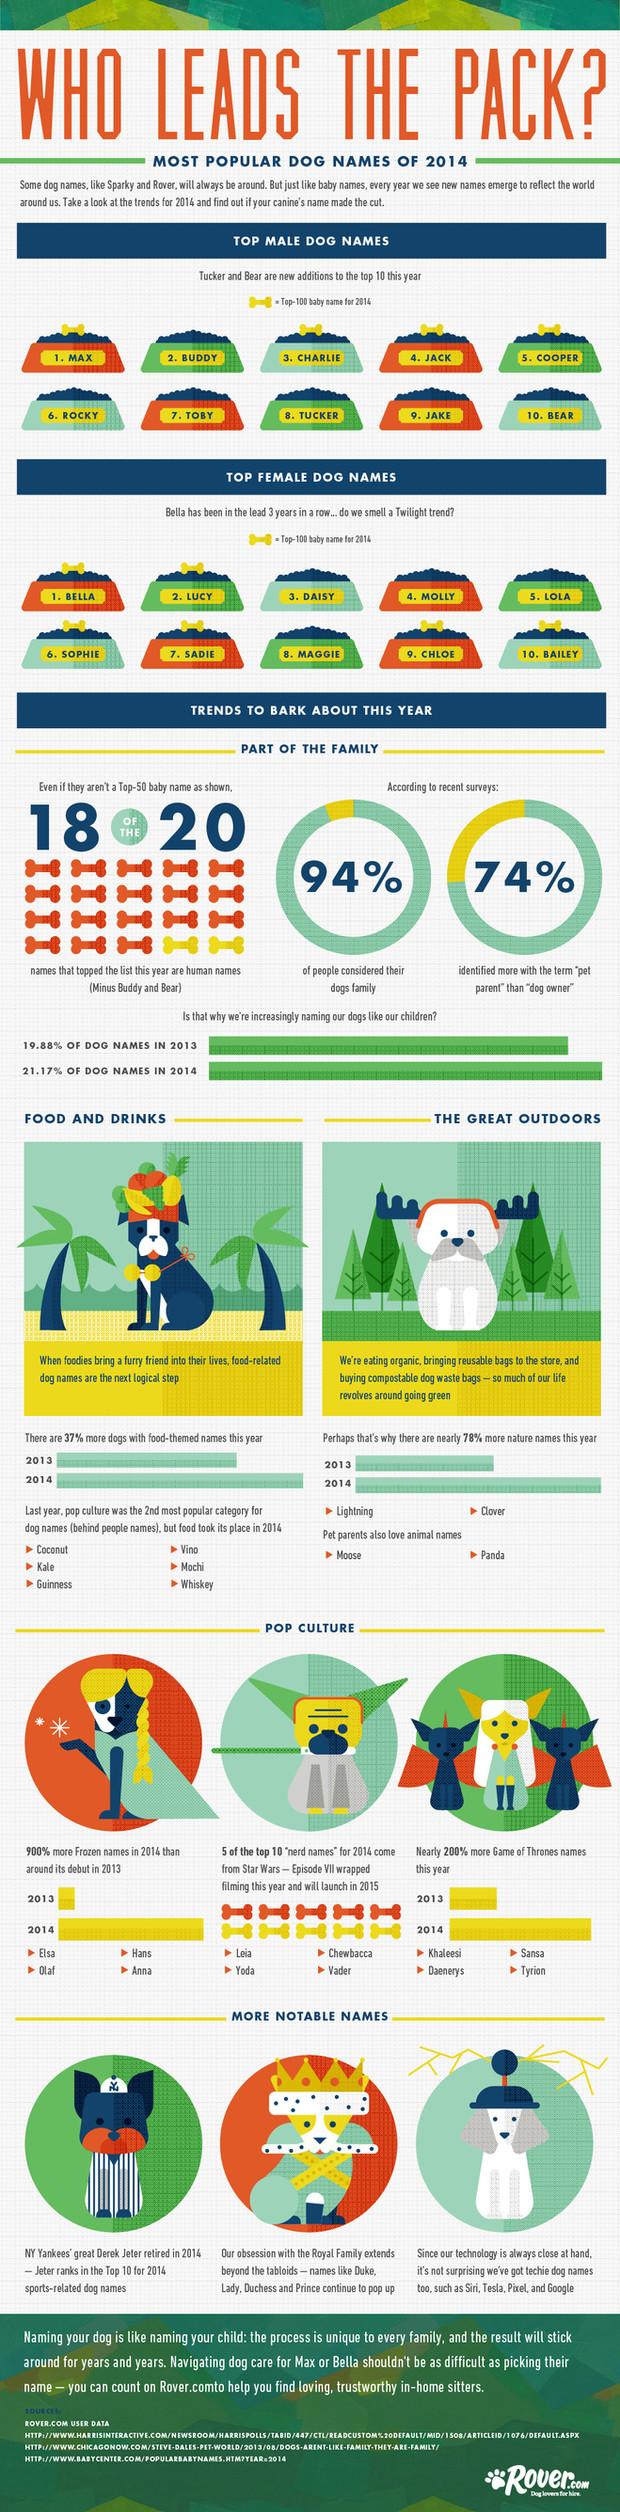 Popular dog names 2014